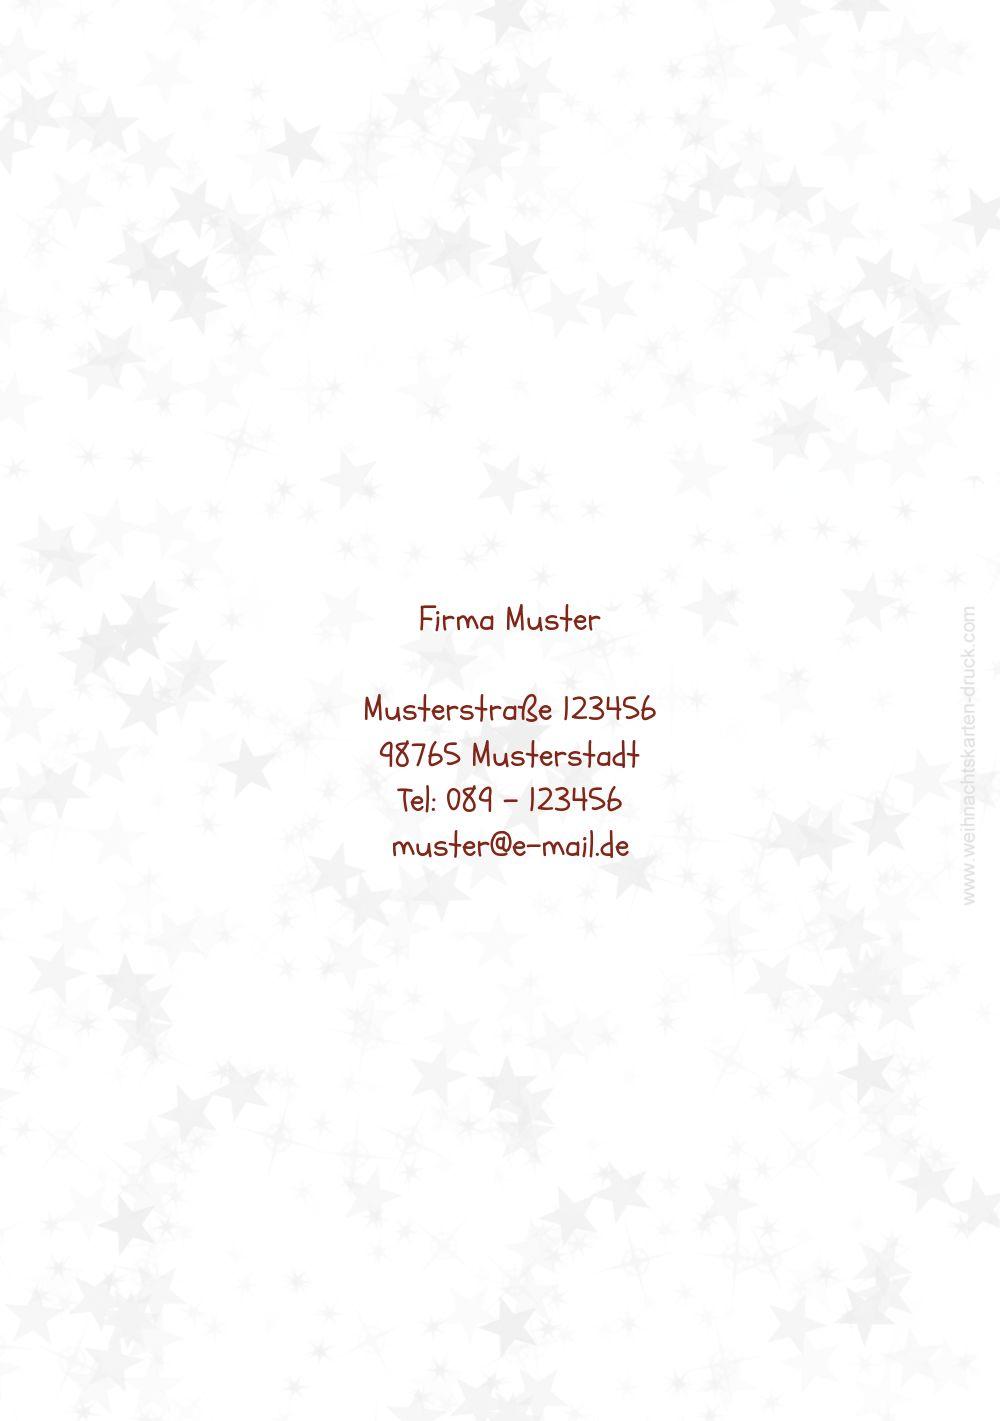 Ansicht 2 - Grußkarte Schriftkugel